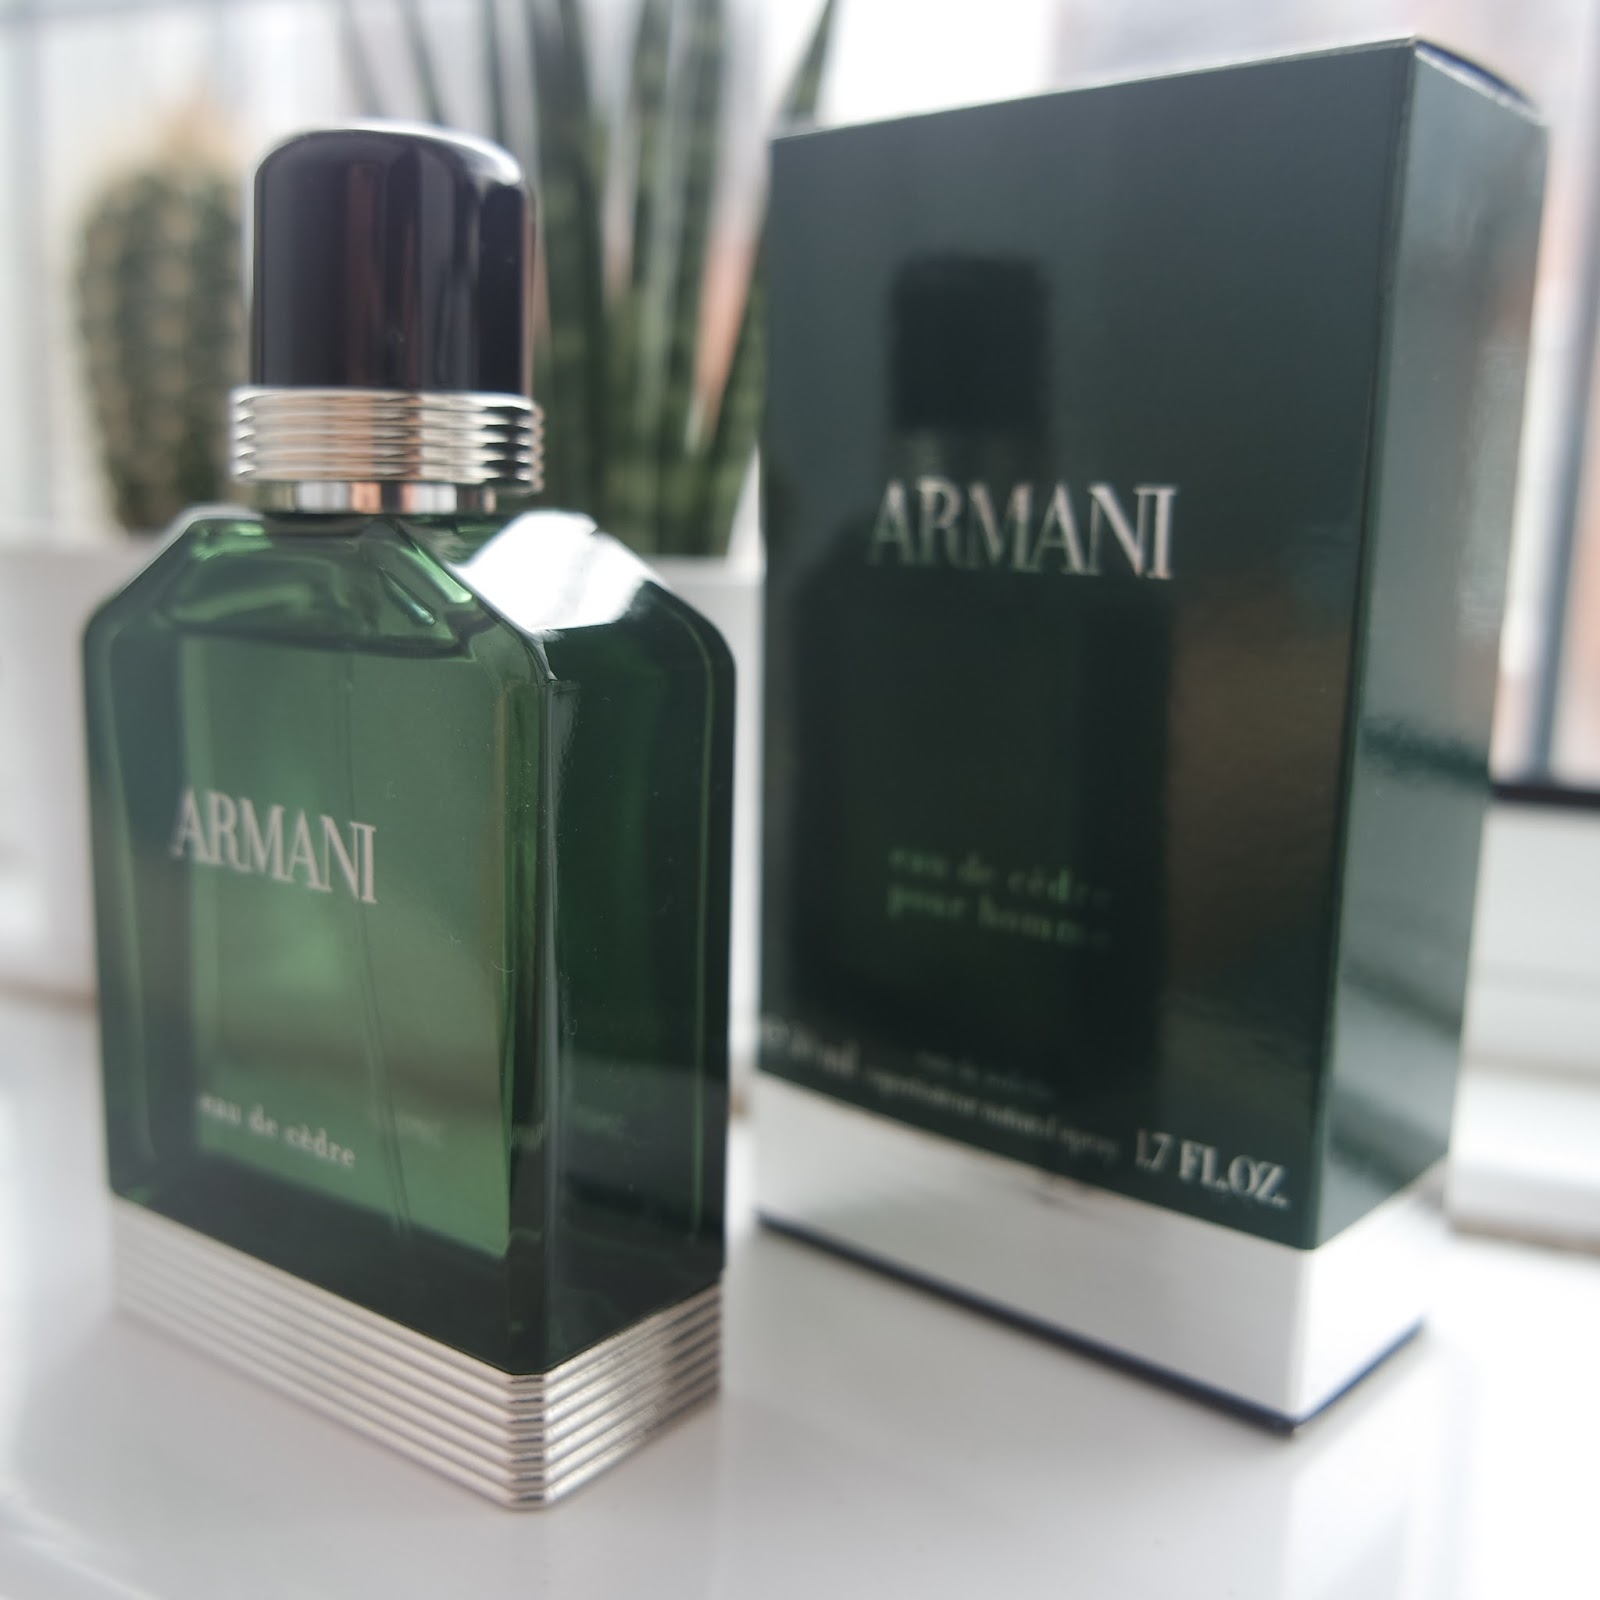 Armani De